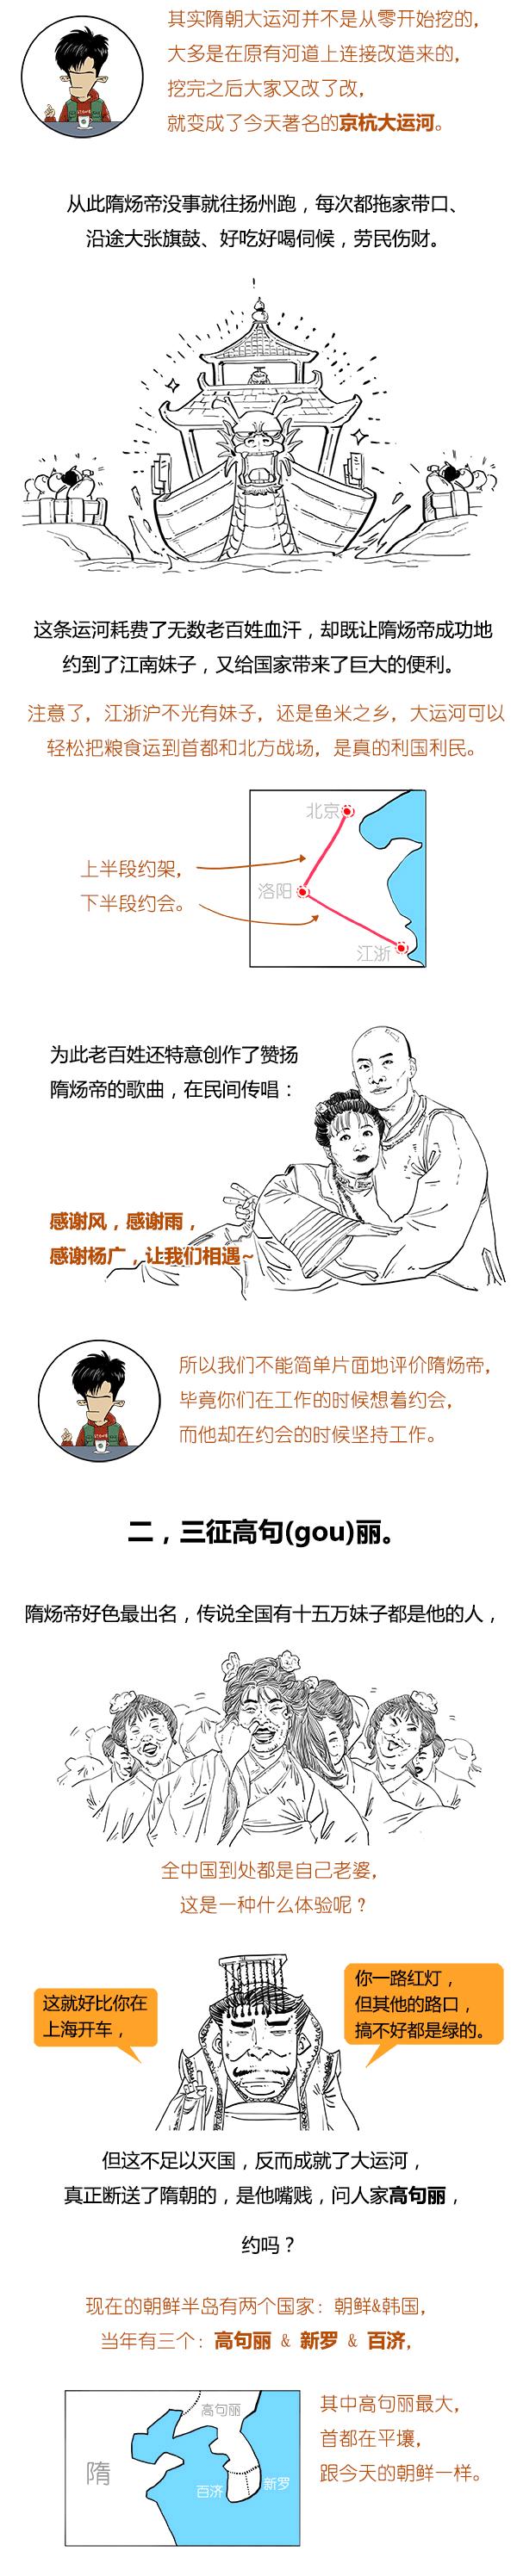 Stone历史剧-隋_05.png